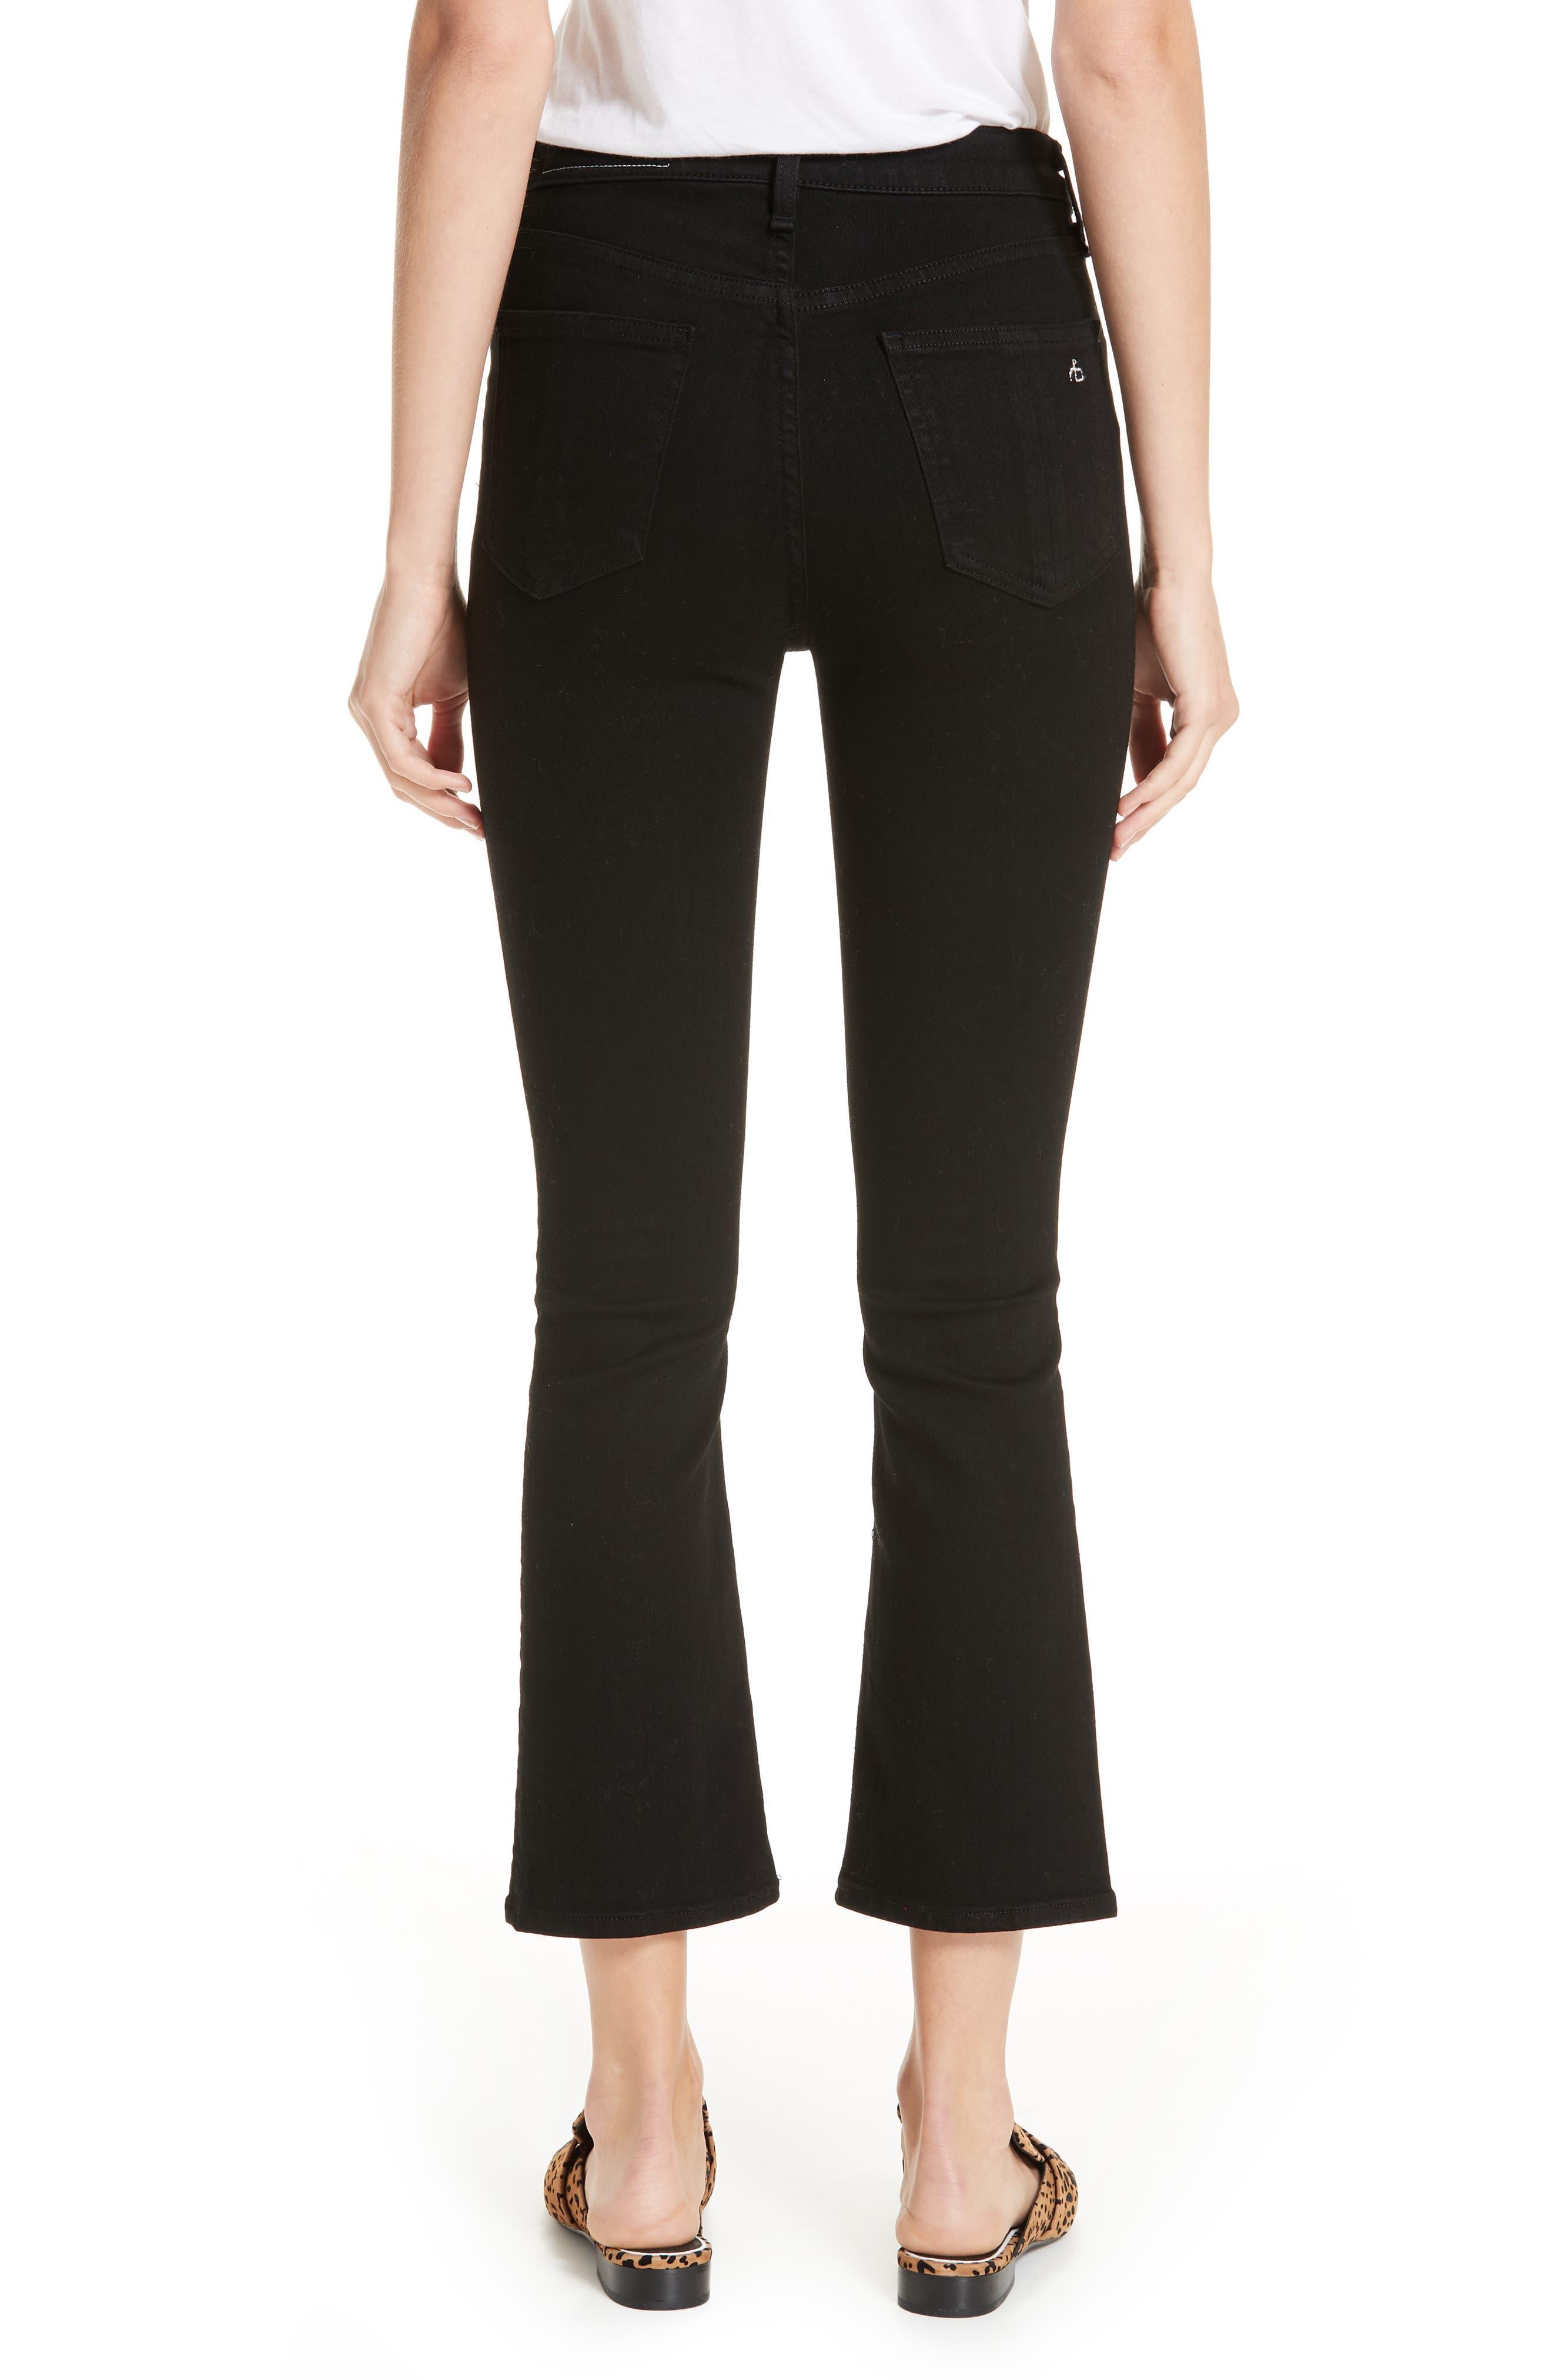 RAG & BONE,                             Hana High Waist Ankle Flare Jeans,                             Alternate thumbnail 2, color,                             001